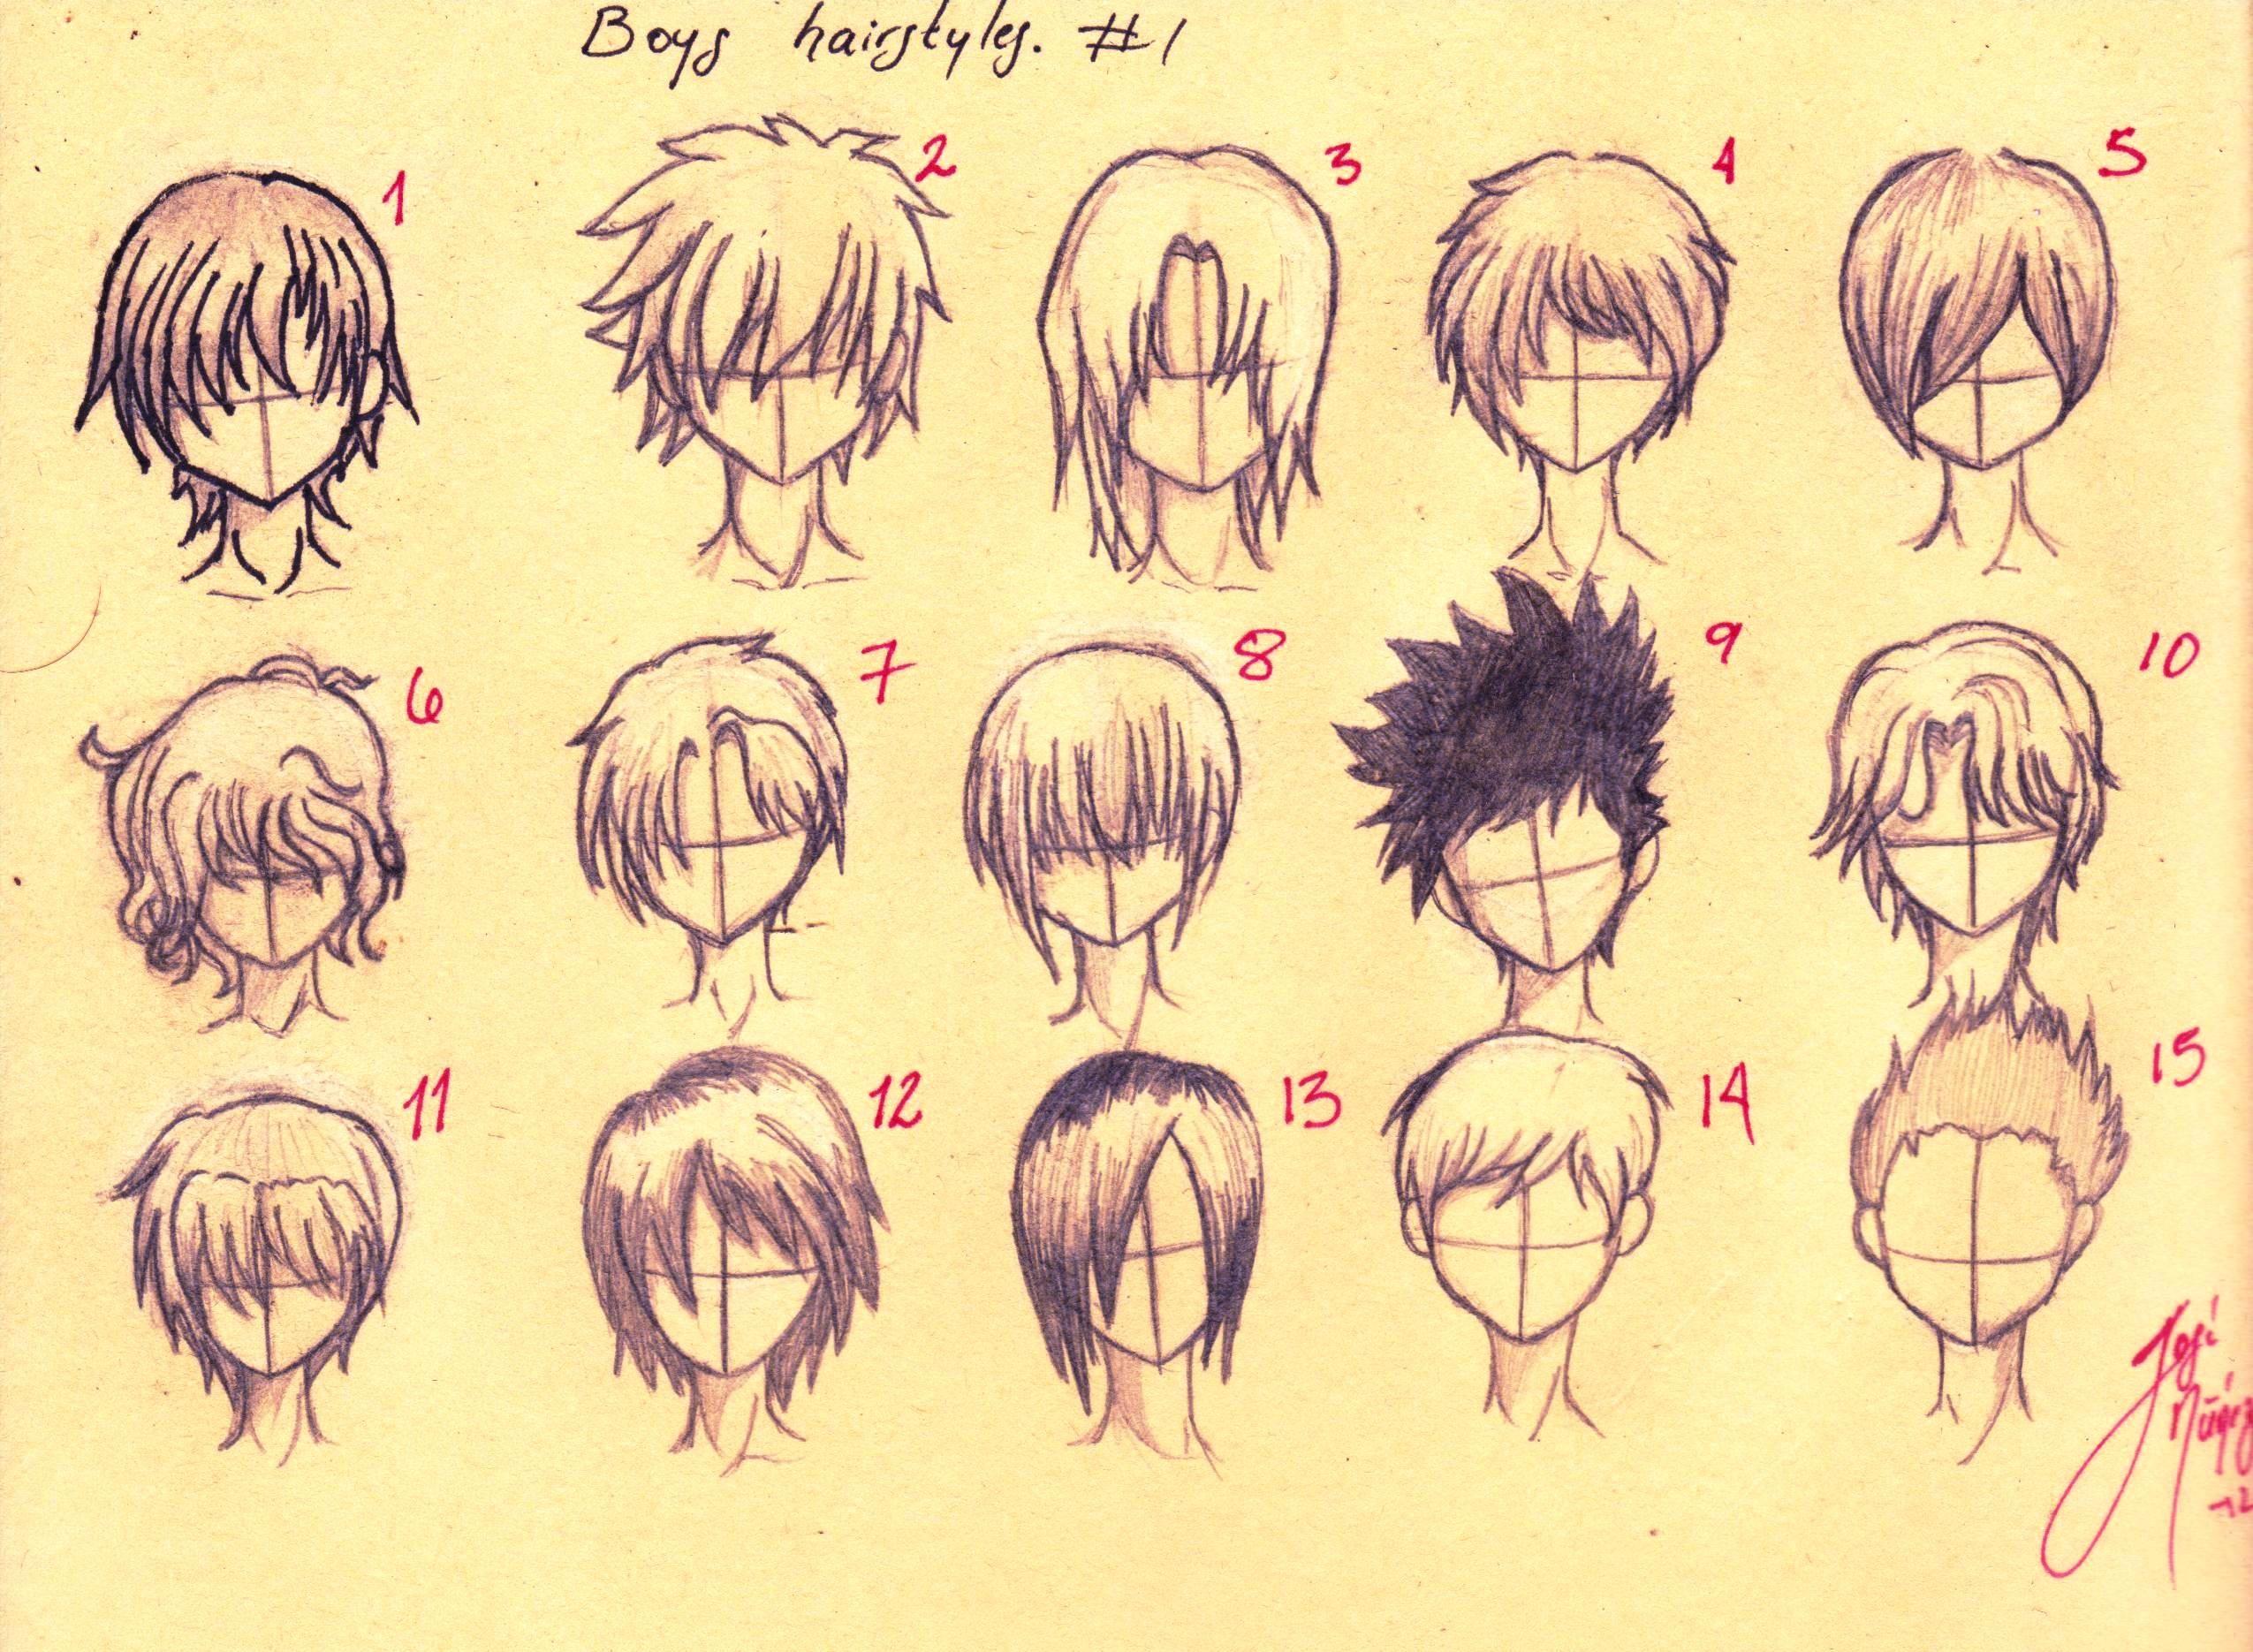 Fabulous 1000 Images About Anime Hairstyles On Pinterest Anime Hair Short Hairstyles For Black Women Fulllsitofus